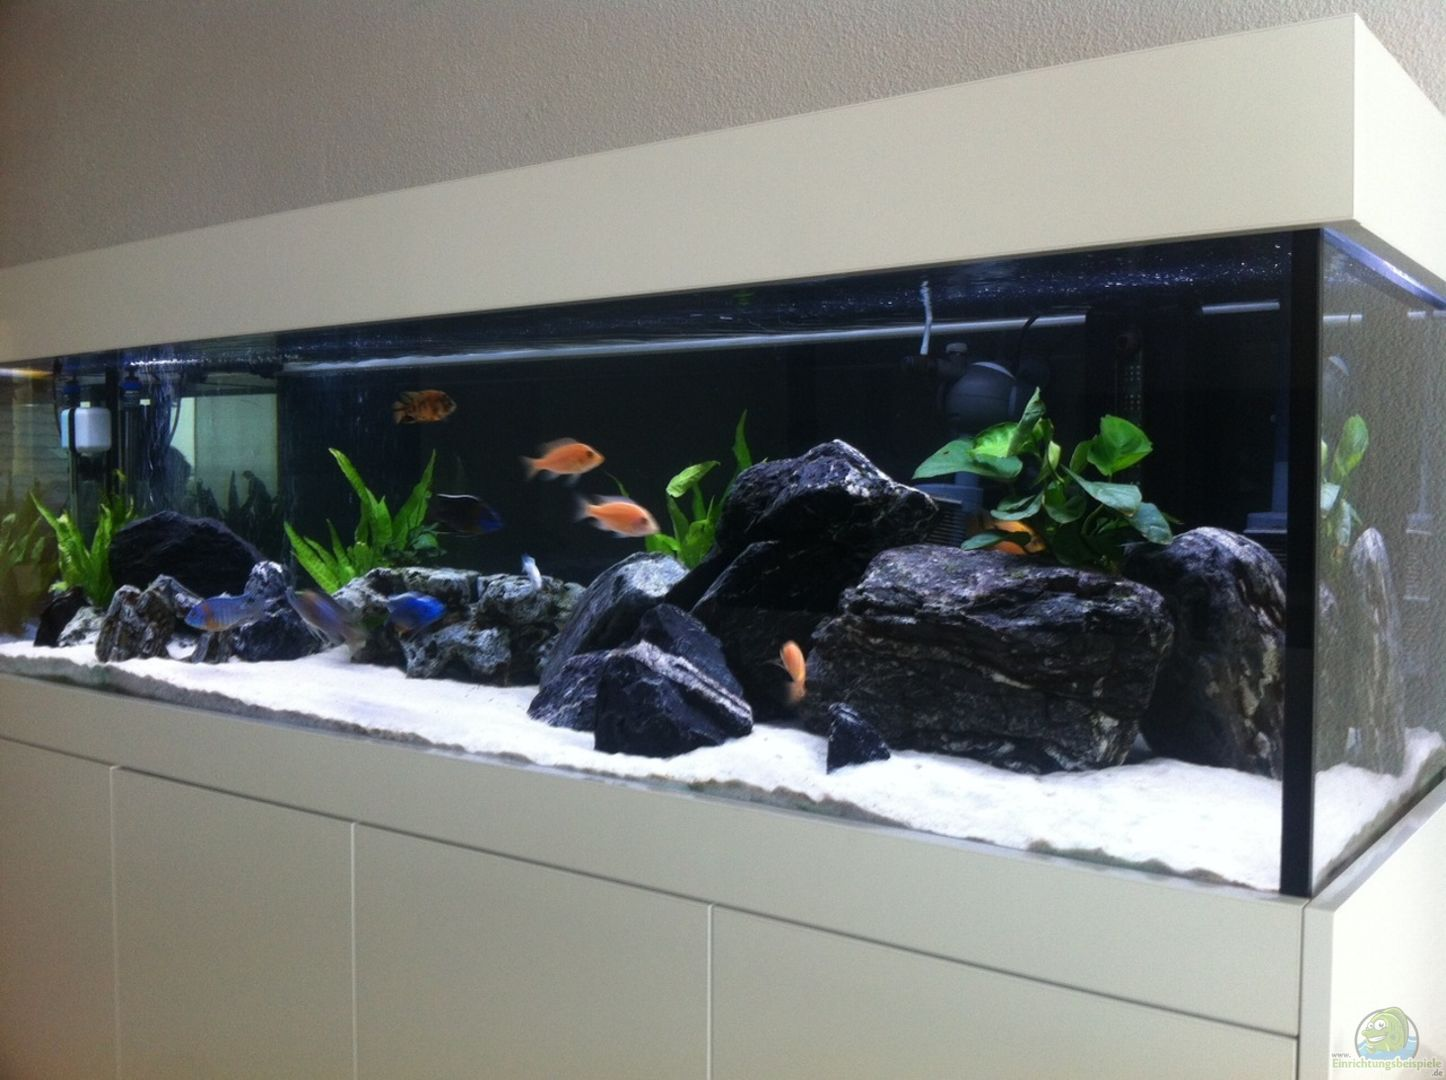 aquarium malawi aus malawi von axxo. Black Bedroom Furniture Sets. Home Design Ideas